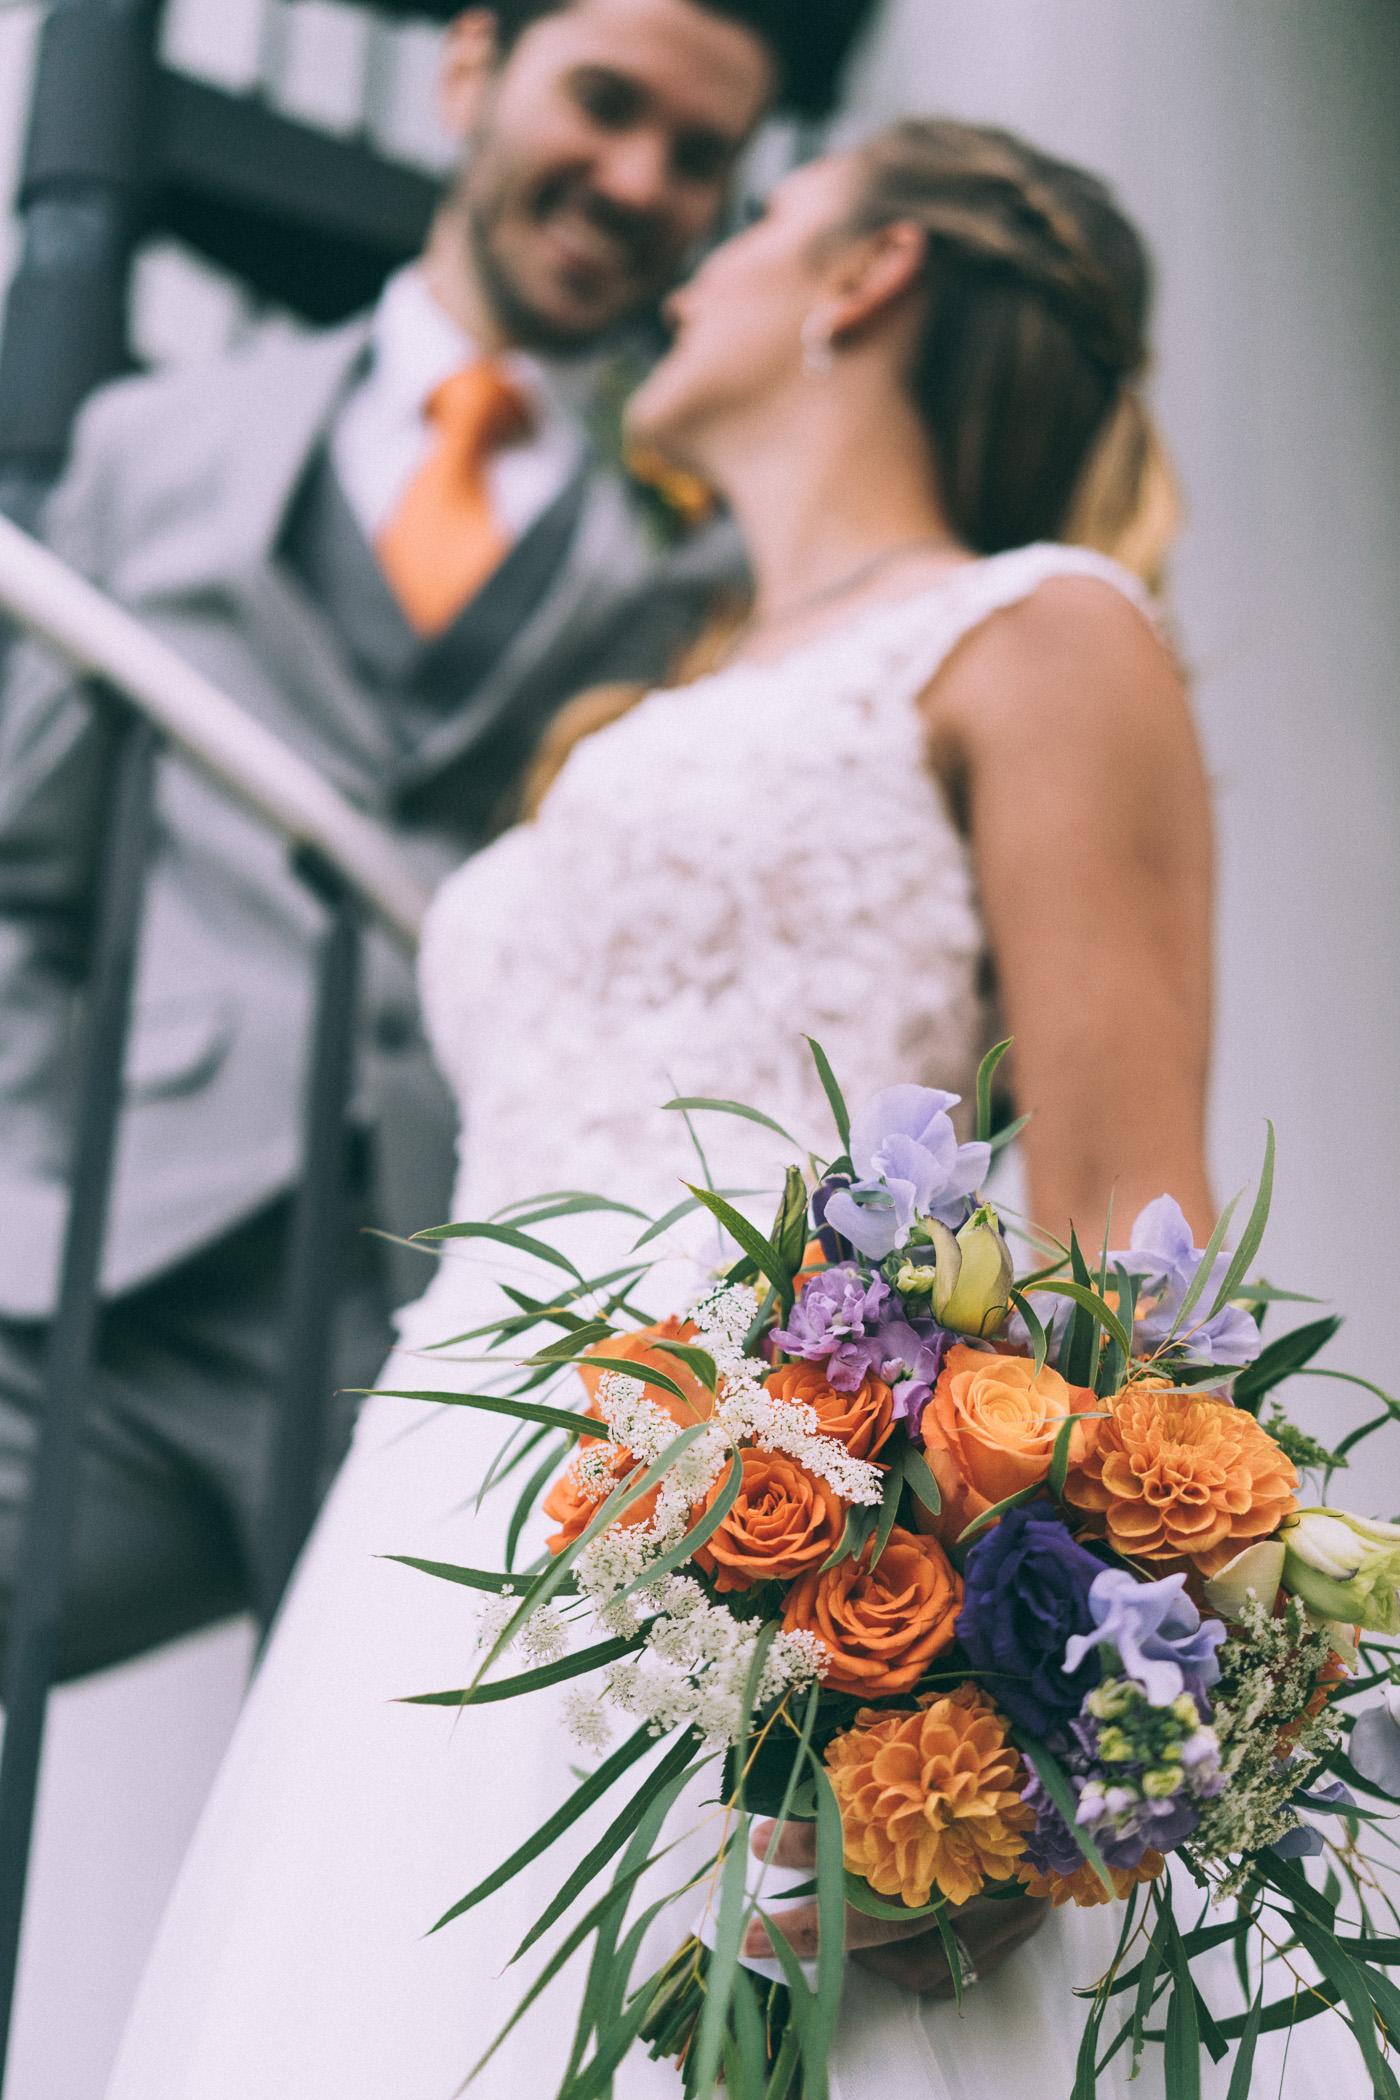 ambers bouquet.jpg